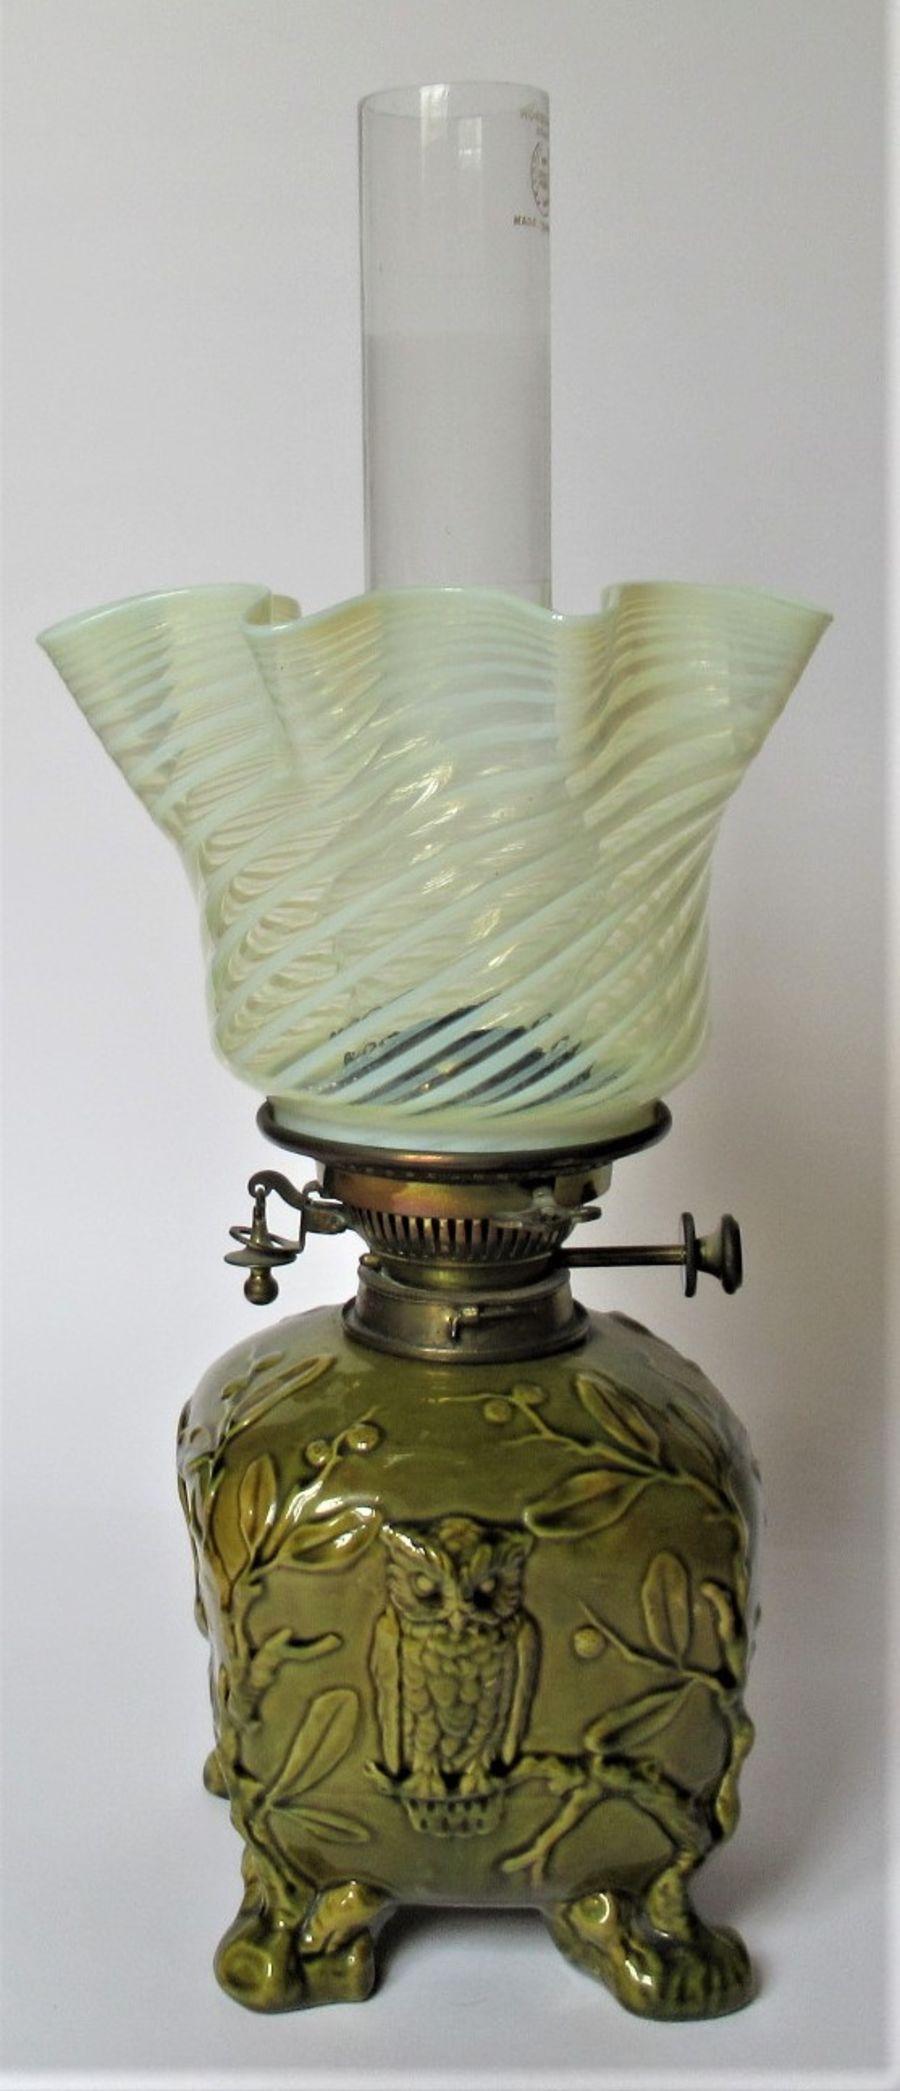 Wedgwood Aesthetic Period Majolica Oil Lamp with Full Period Fittings c.1880